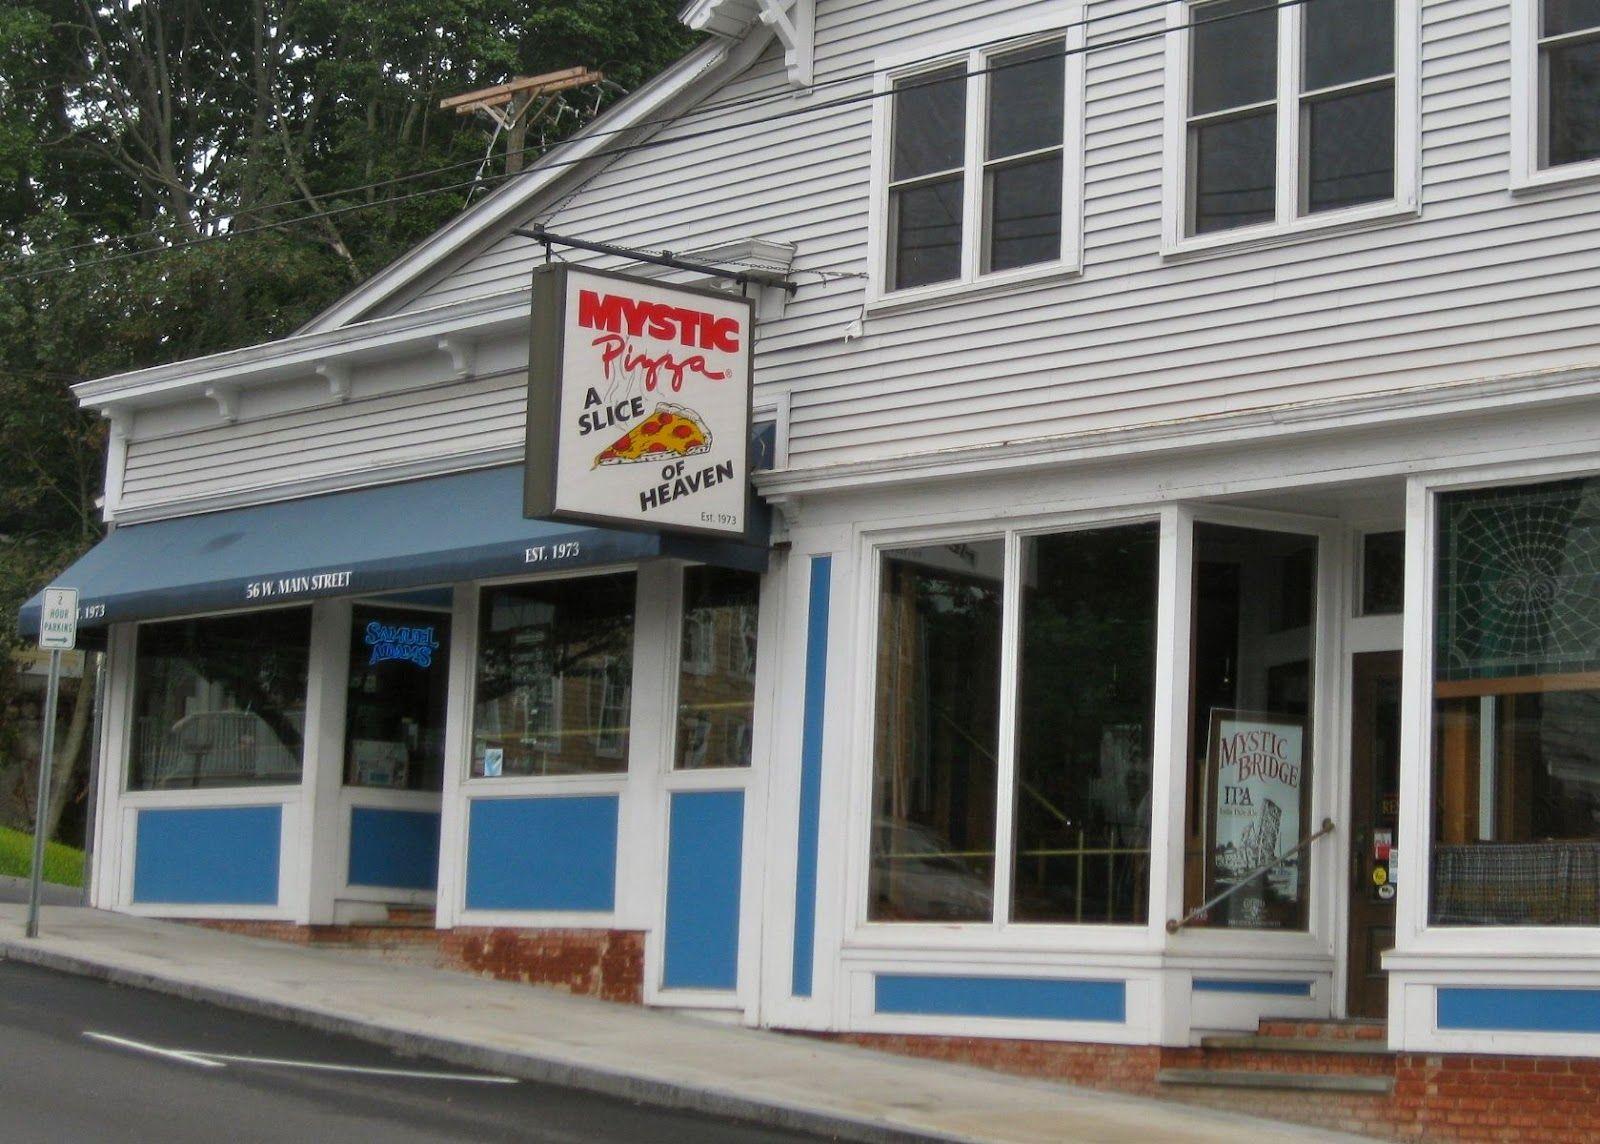 My Life Today Mystic Seaport Flea Market And Newport Rhode Island Mystic Seaport Rhode Island Mystic